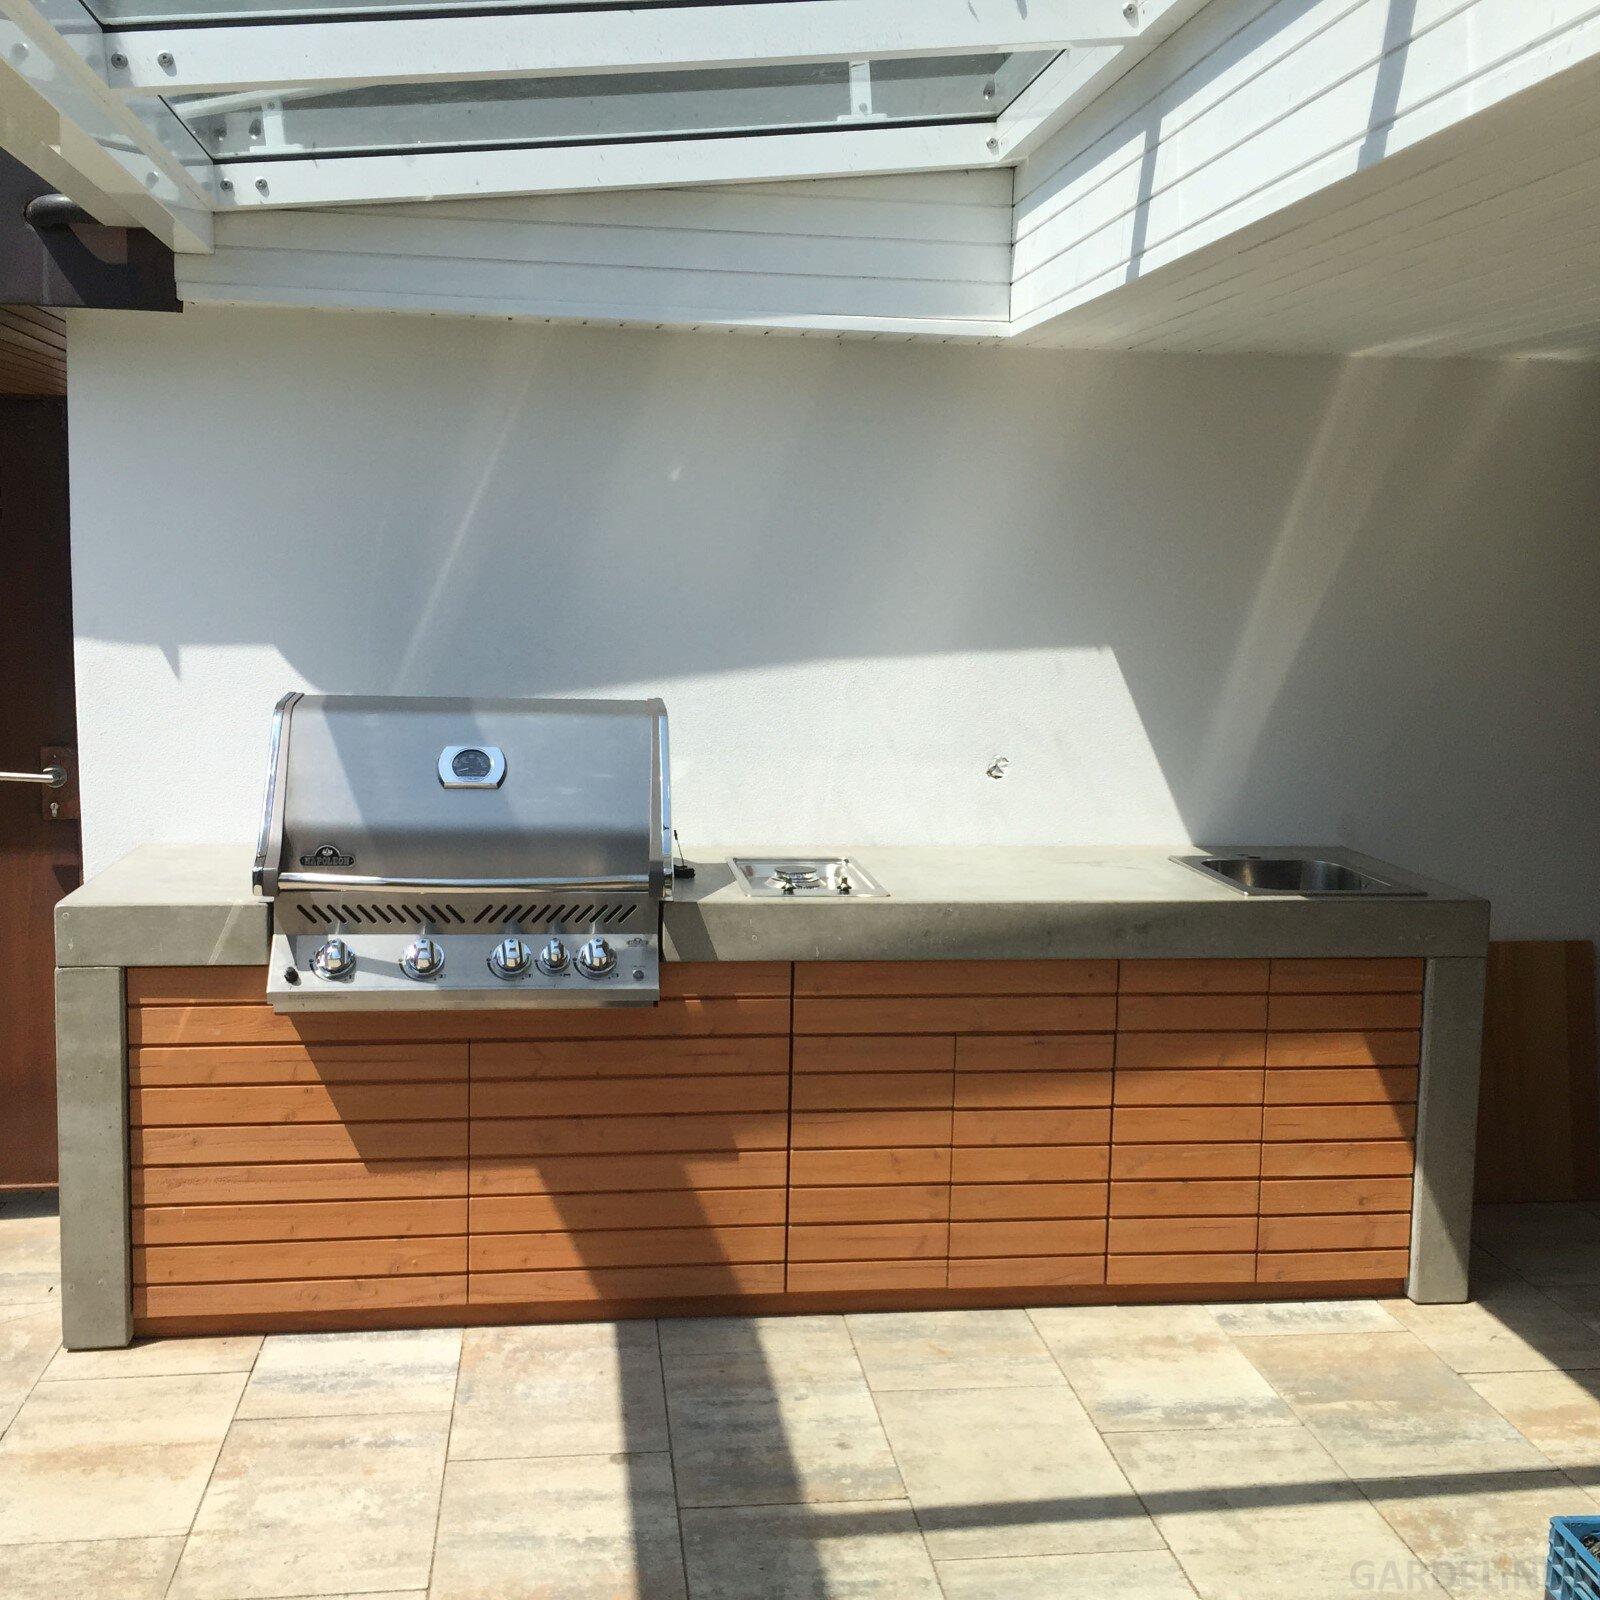 Beton Outdoorküche mit Napoleon Grill | Gardelino.de ...